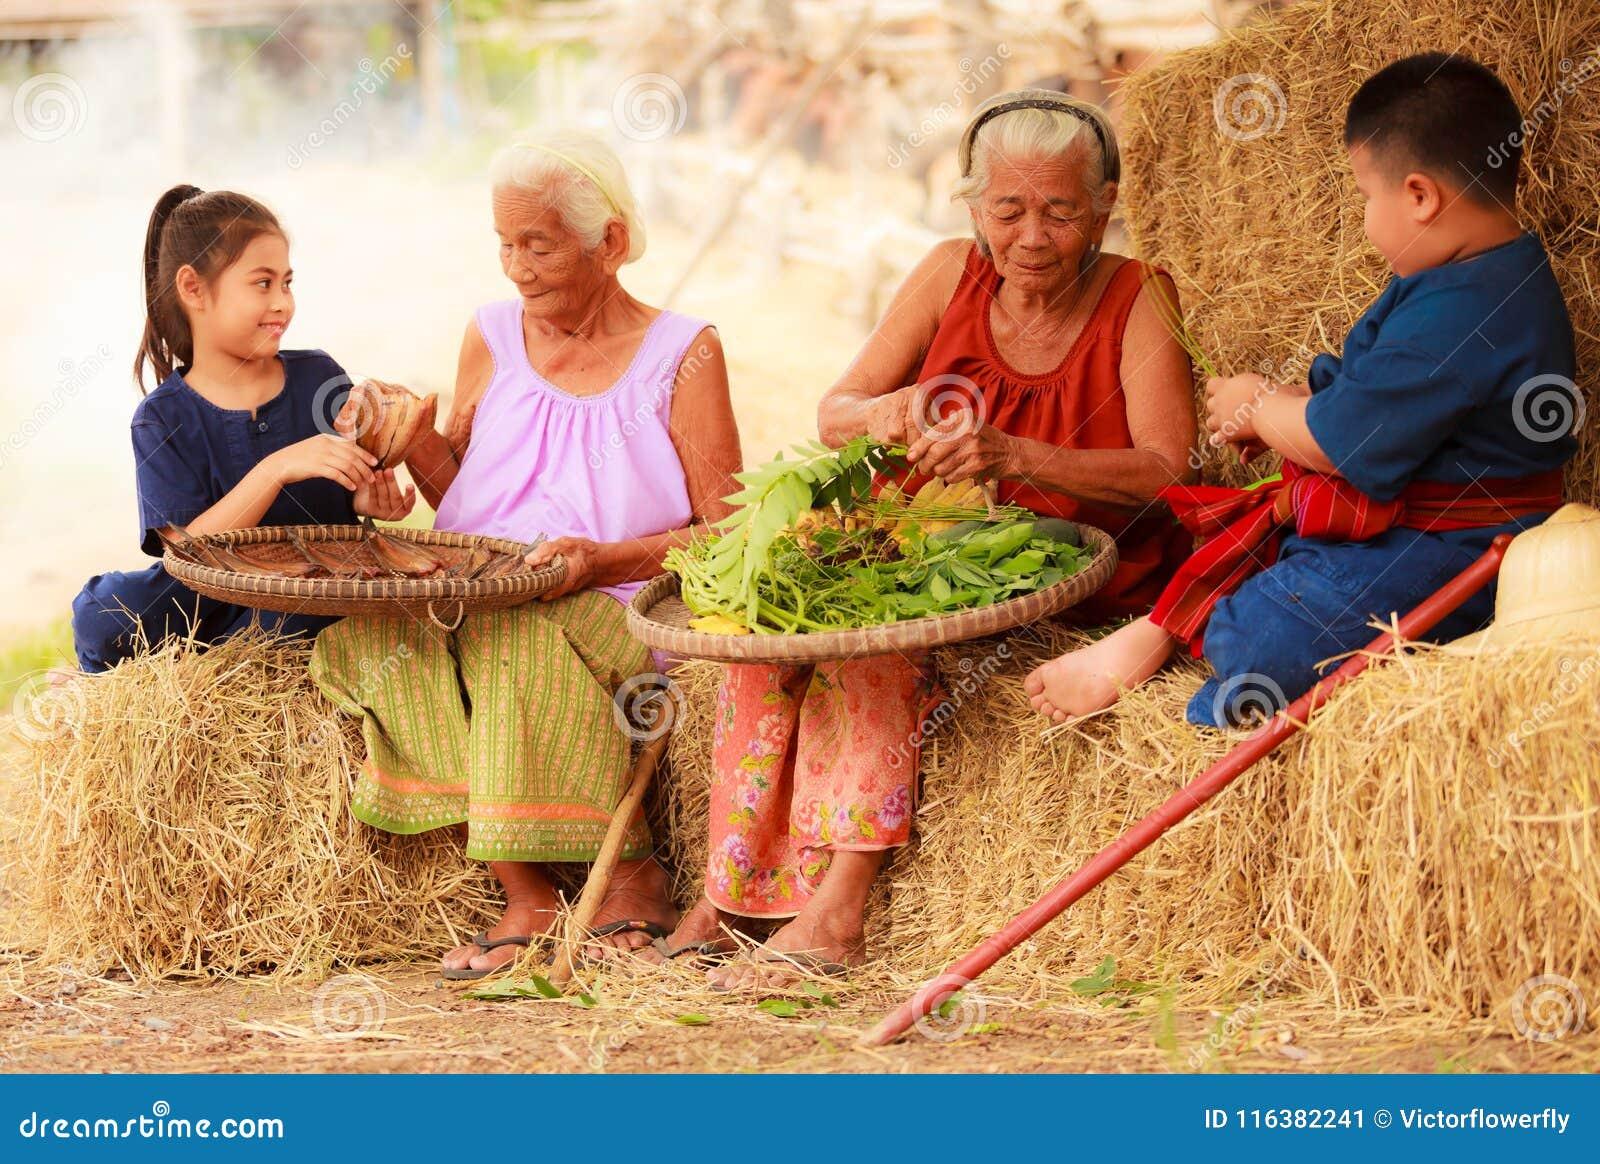 Traditional Asian Thai rural daily life, grandchildren in cultural costumes help their seniors preparing local food ingredients